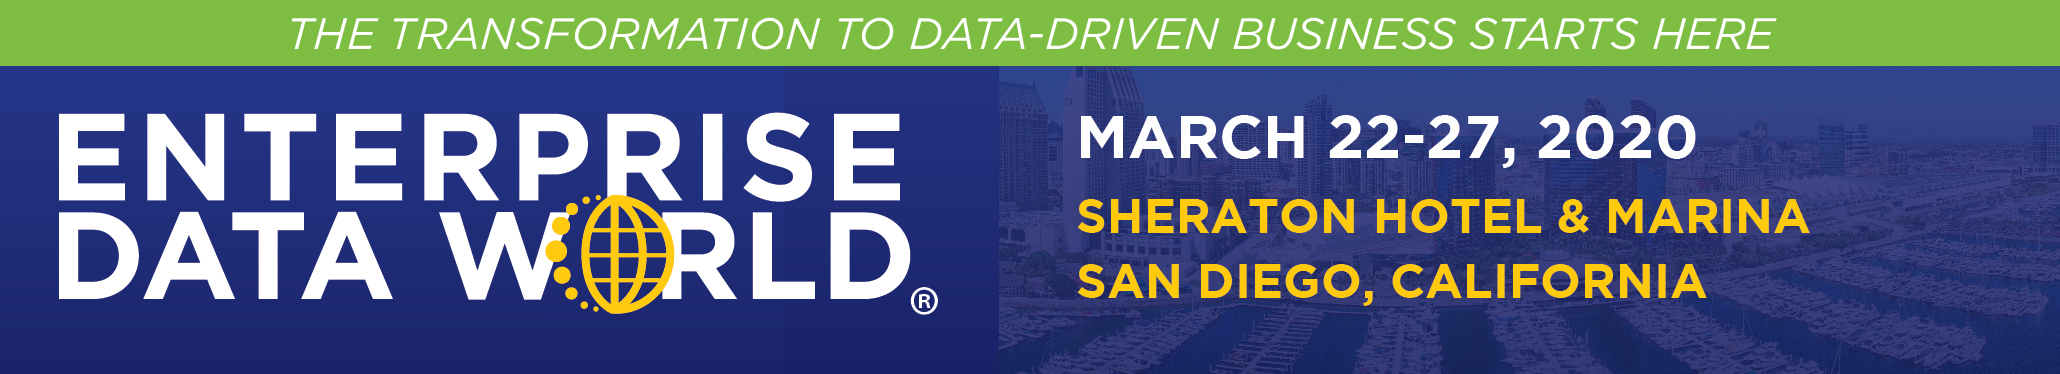 Enterprise Data World 2020, San Diego, California, March 22 - 27